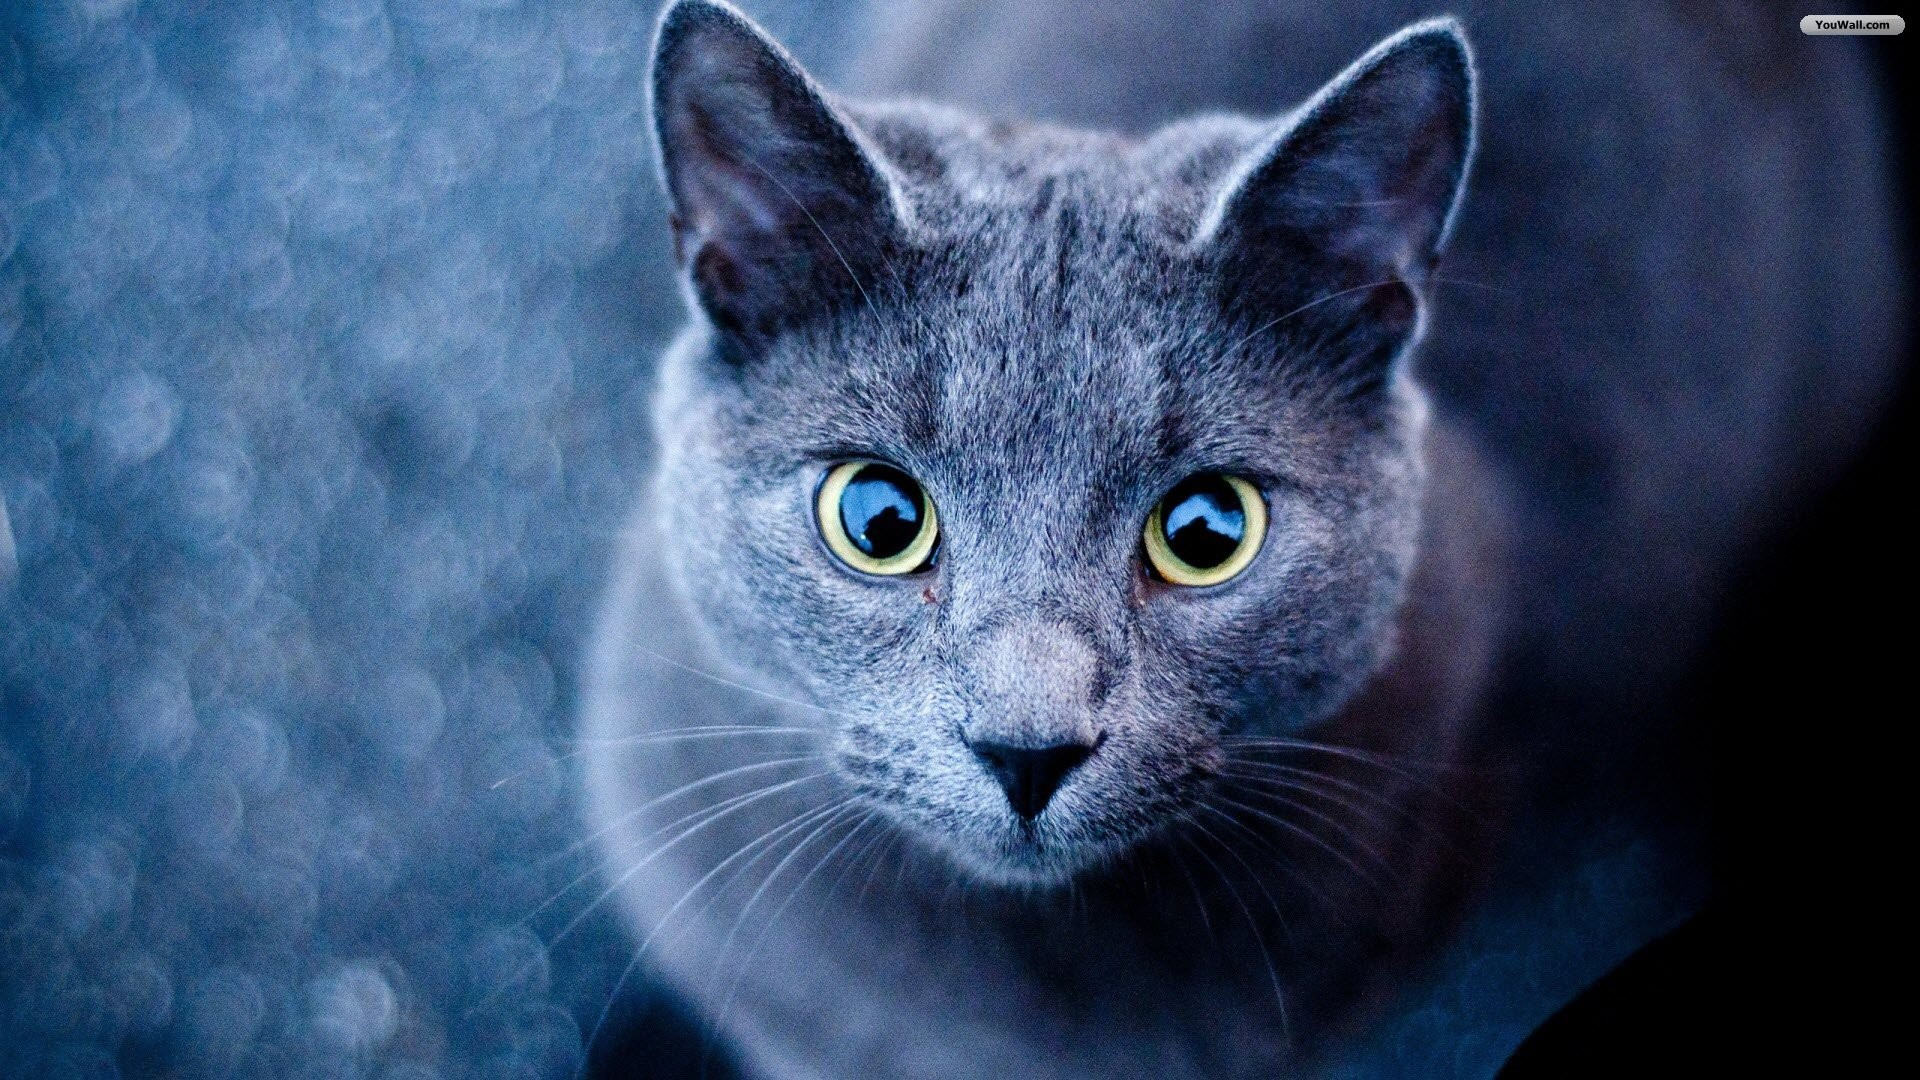 Warrior cats backgrounds wallpapertag - Cute kitten wallpaper free download ...